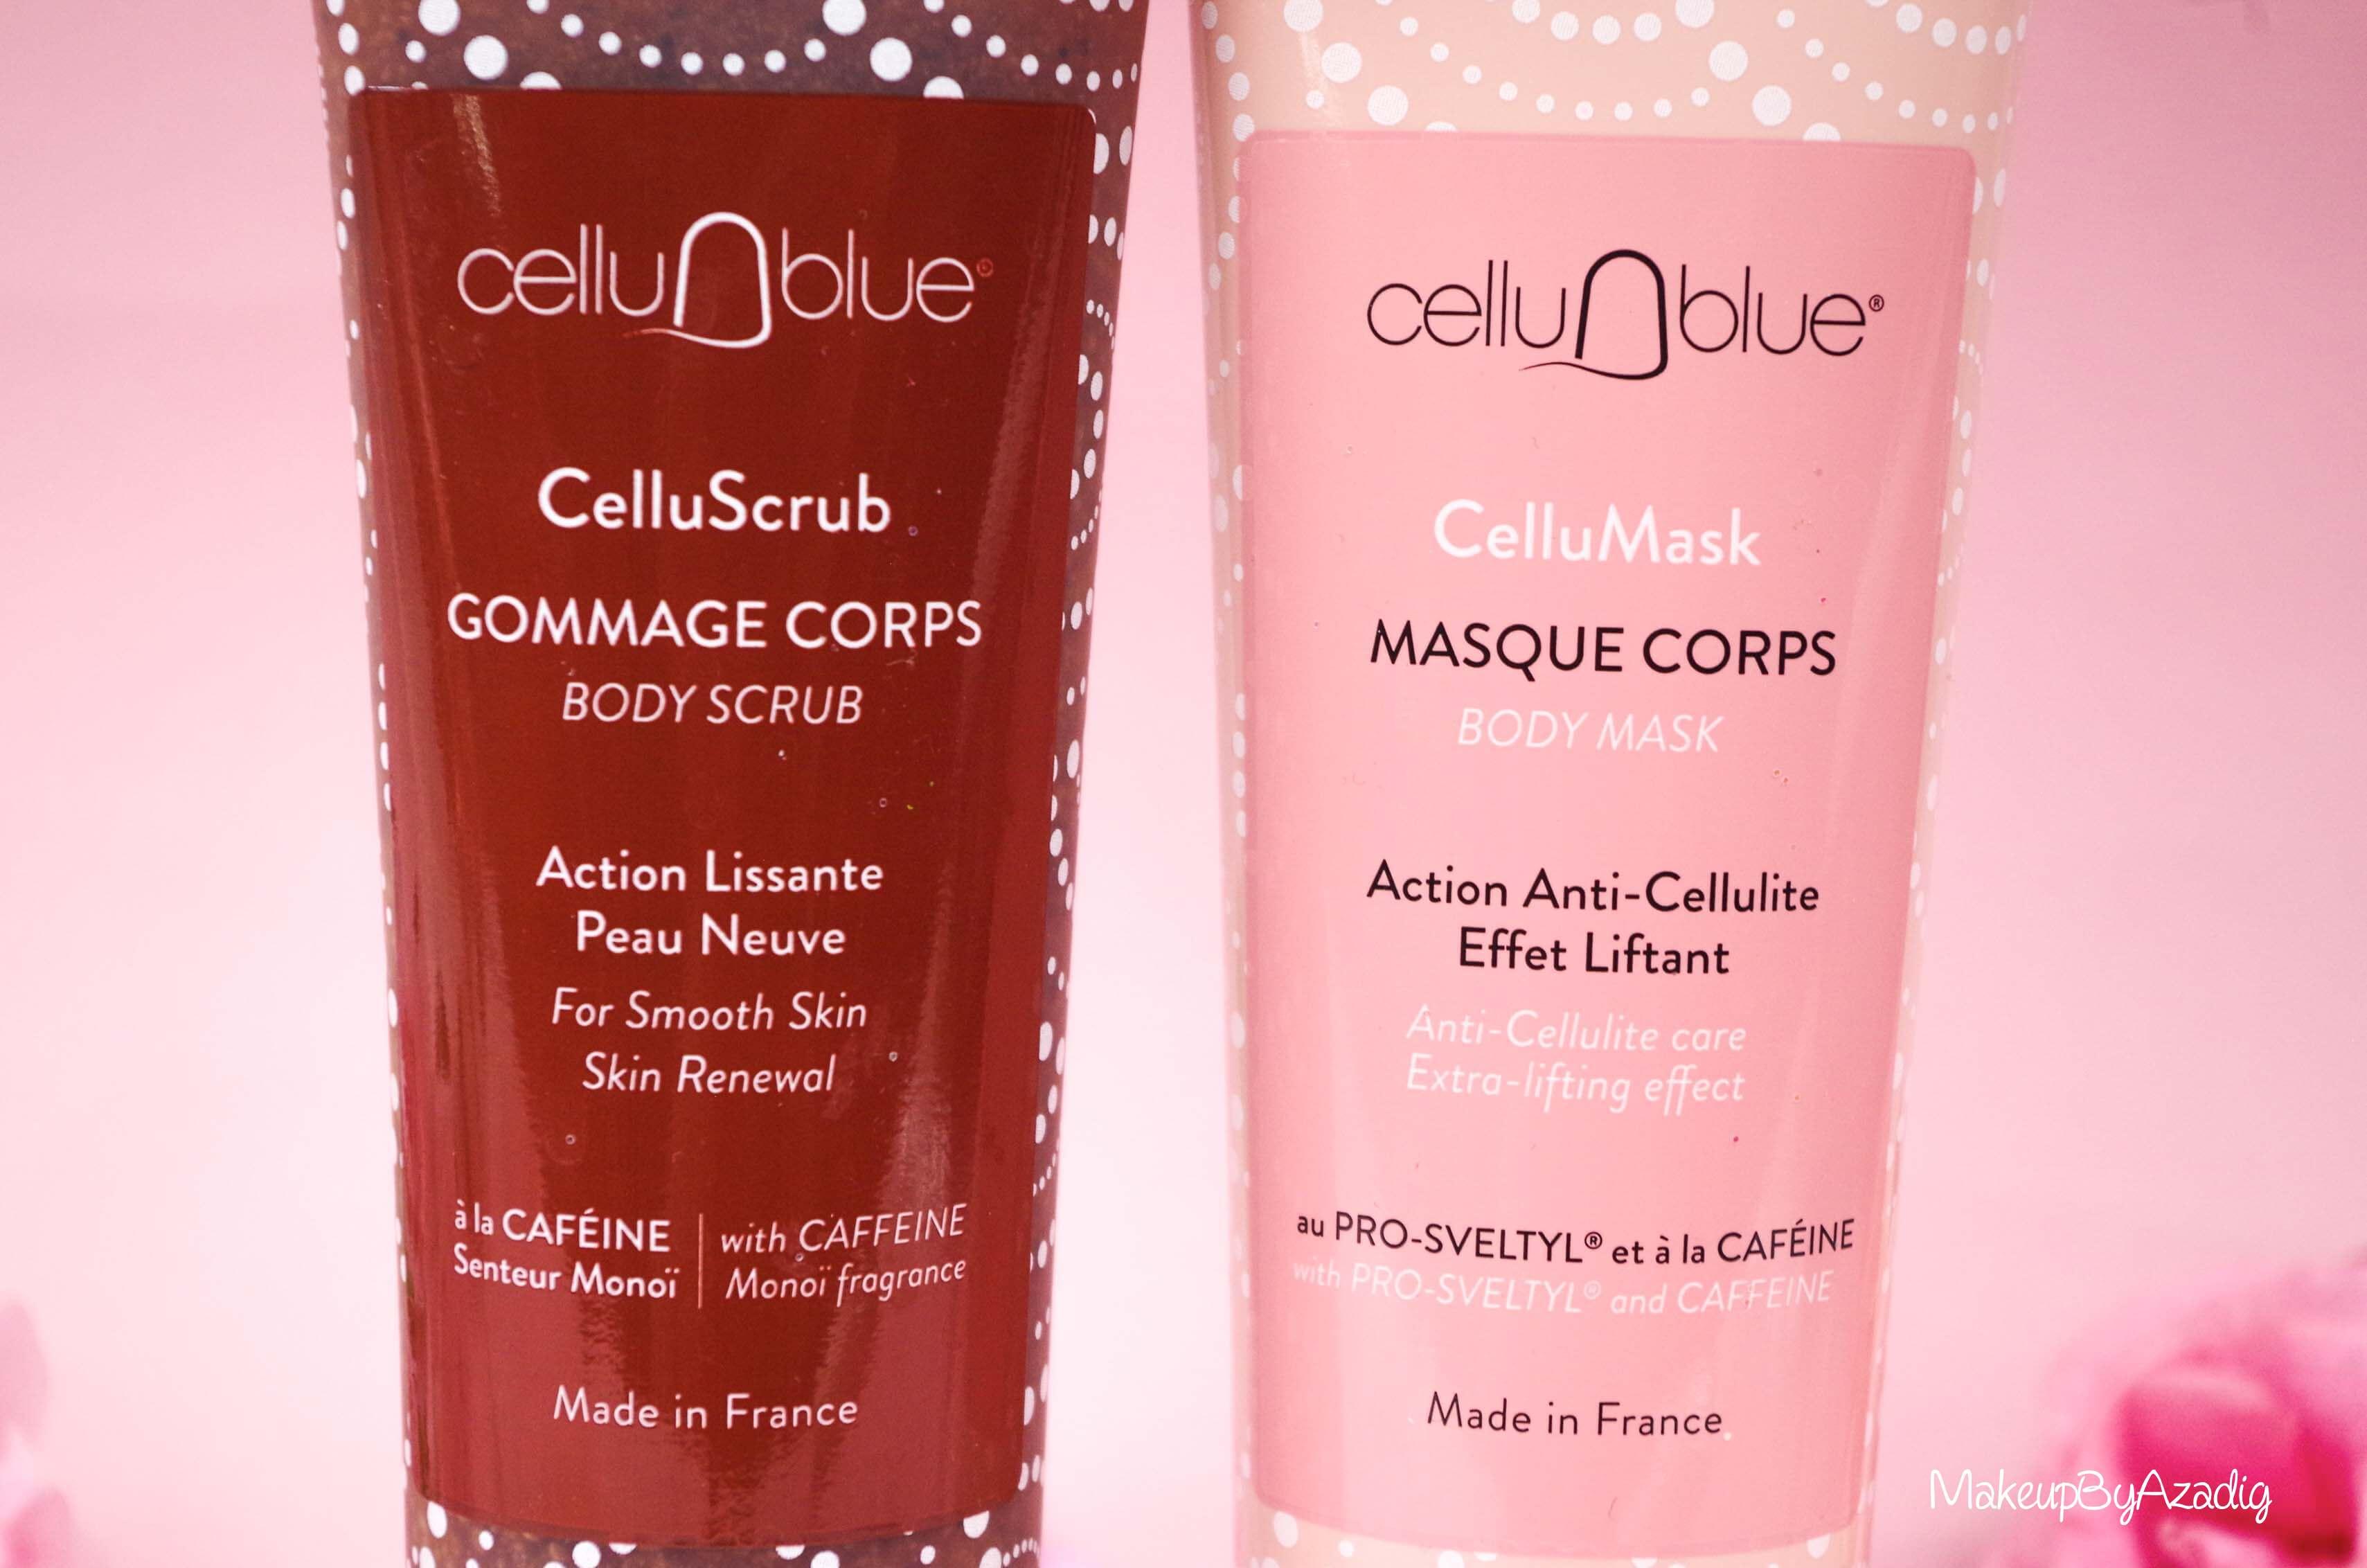 kit-skinduo-masque-gommage-corps-anti-cellulite-monoi-cellublue-ventouse-avis-prix-code-promo-makeupbyazadig-duo